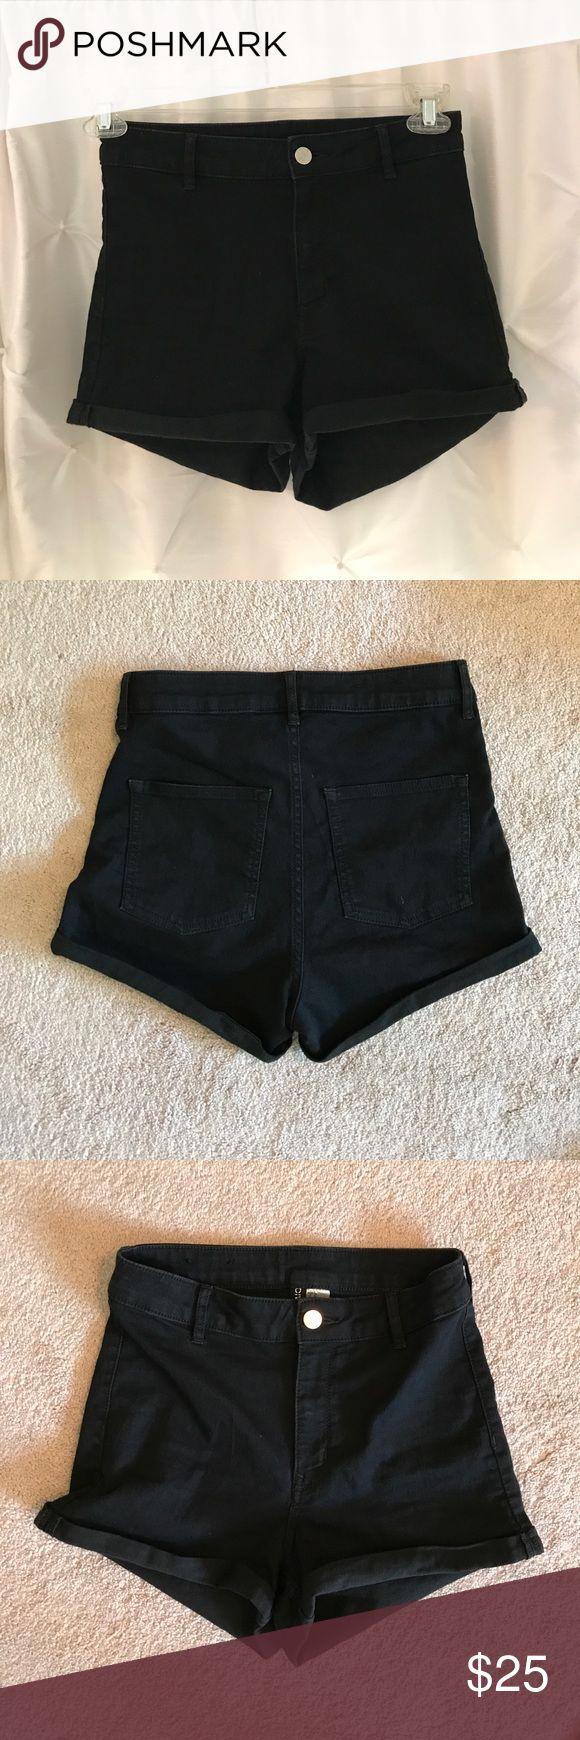 High waisted black jean shorts Super soft jean material, fitted black jean shorts, high waisted. H&M Shorts Jean Shorts